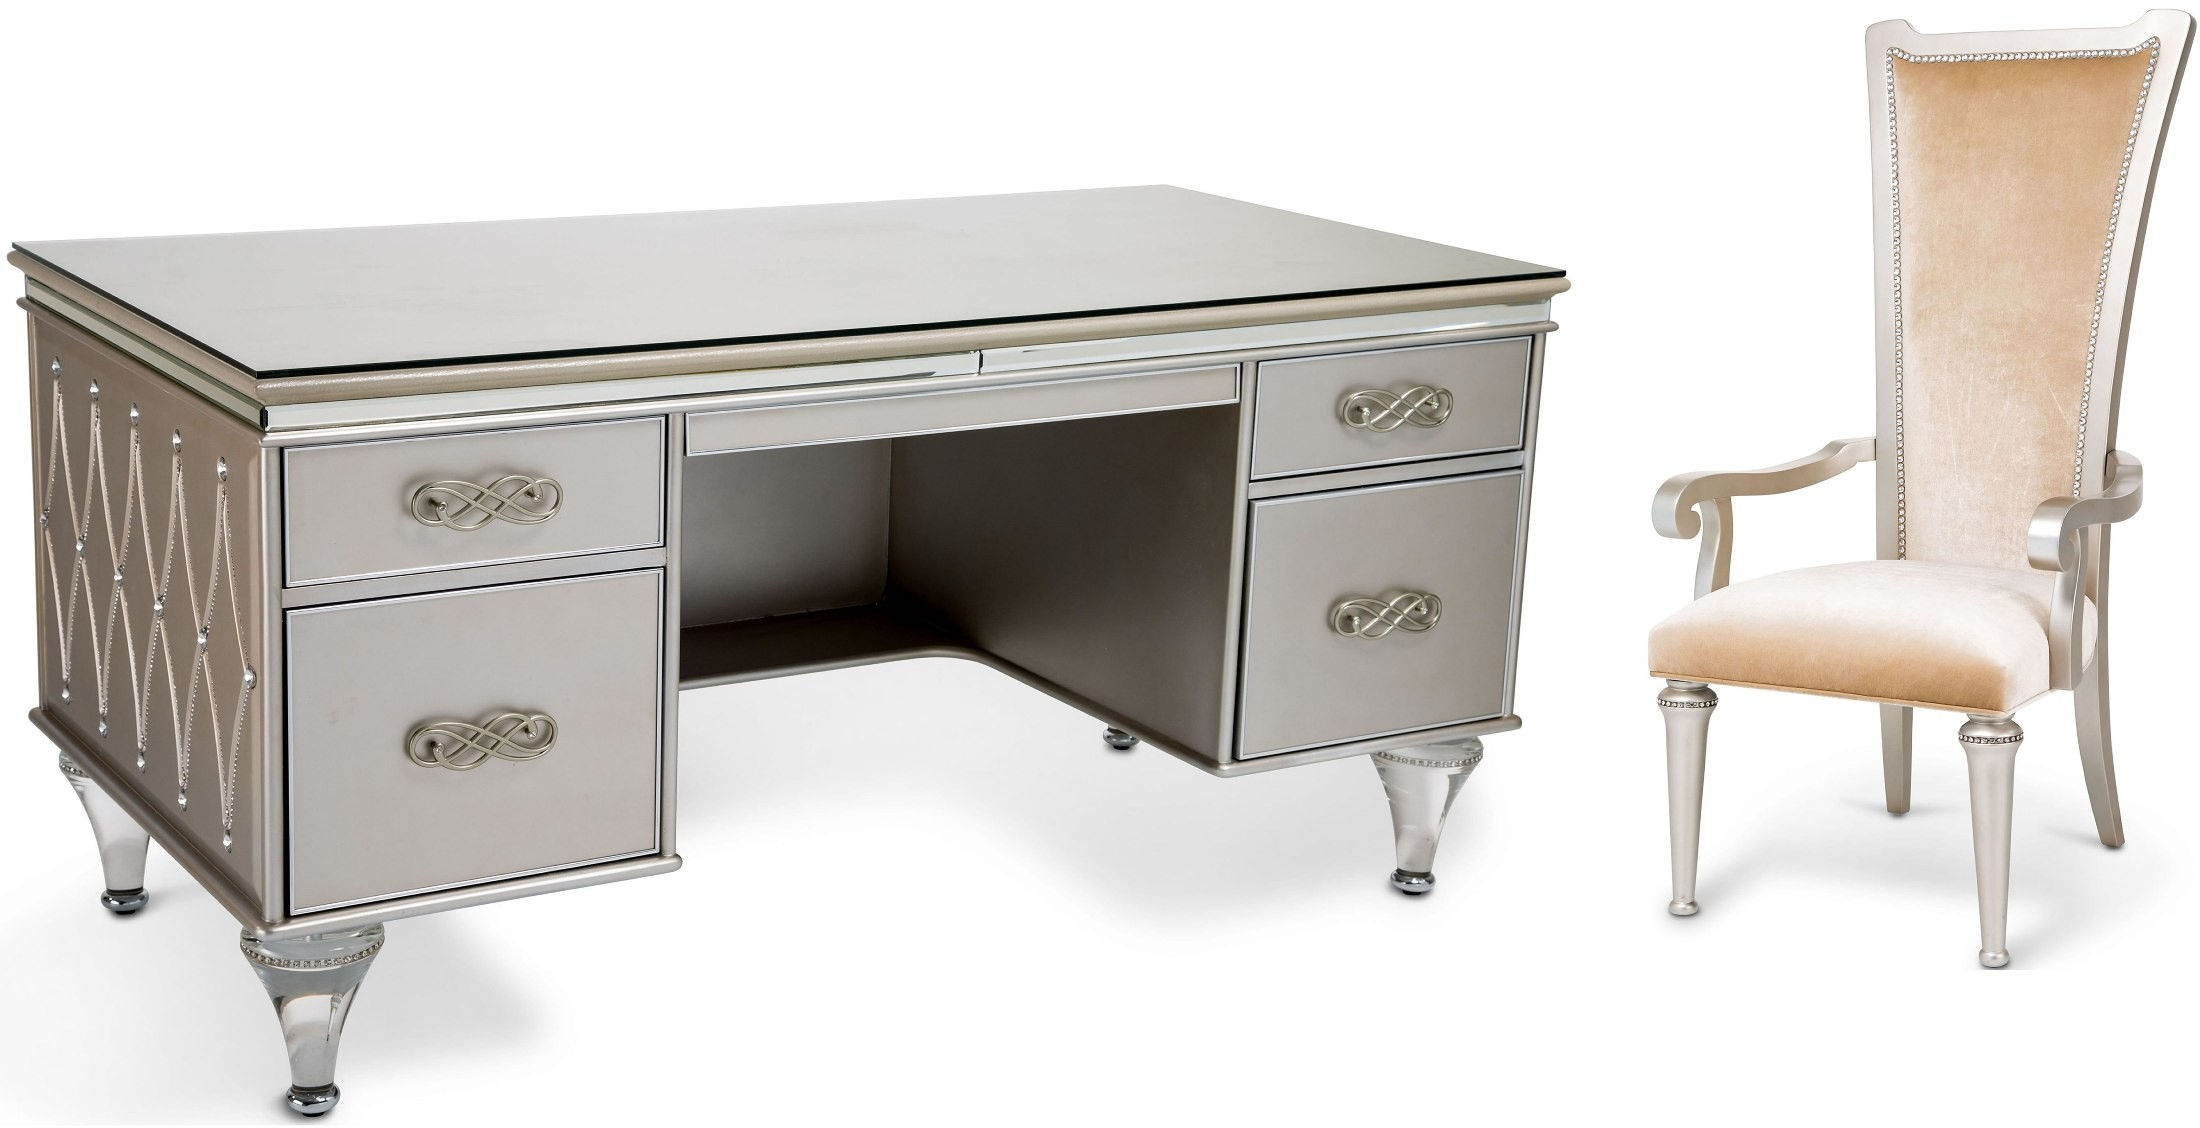 51 Bel Furniture Office Desk AICO Air Park Chair Champagne 9002244 201 TV